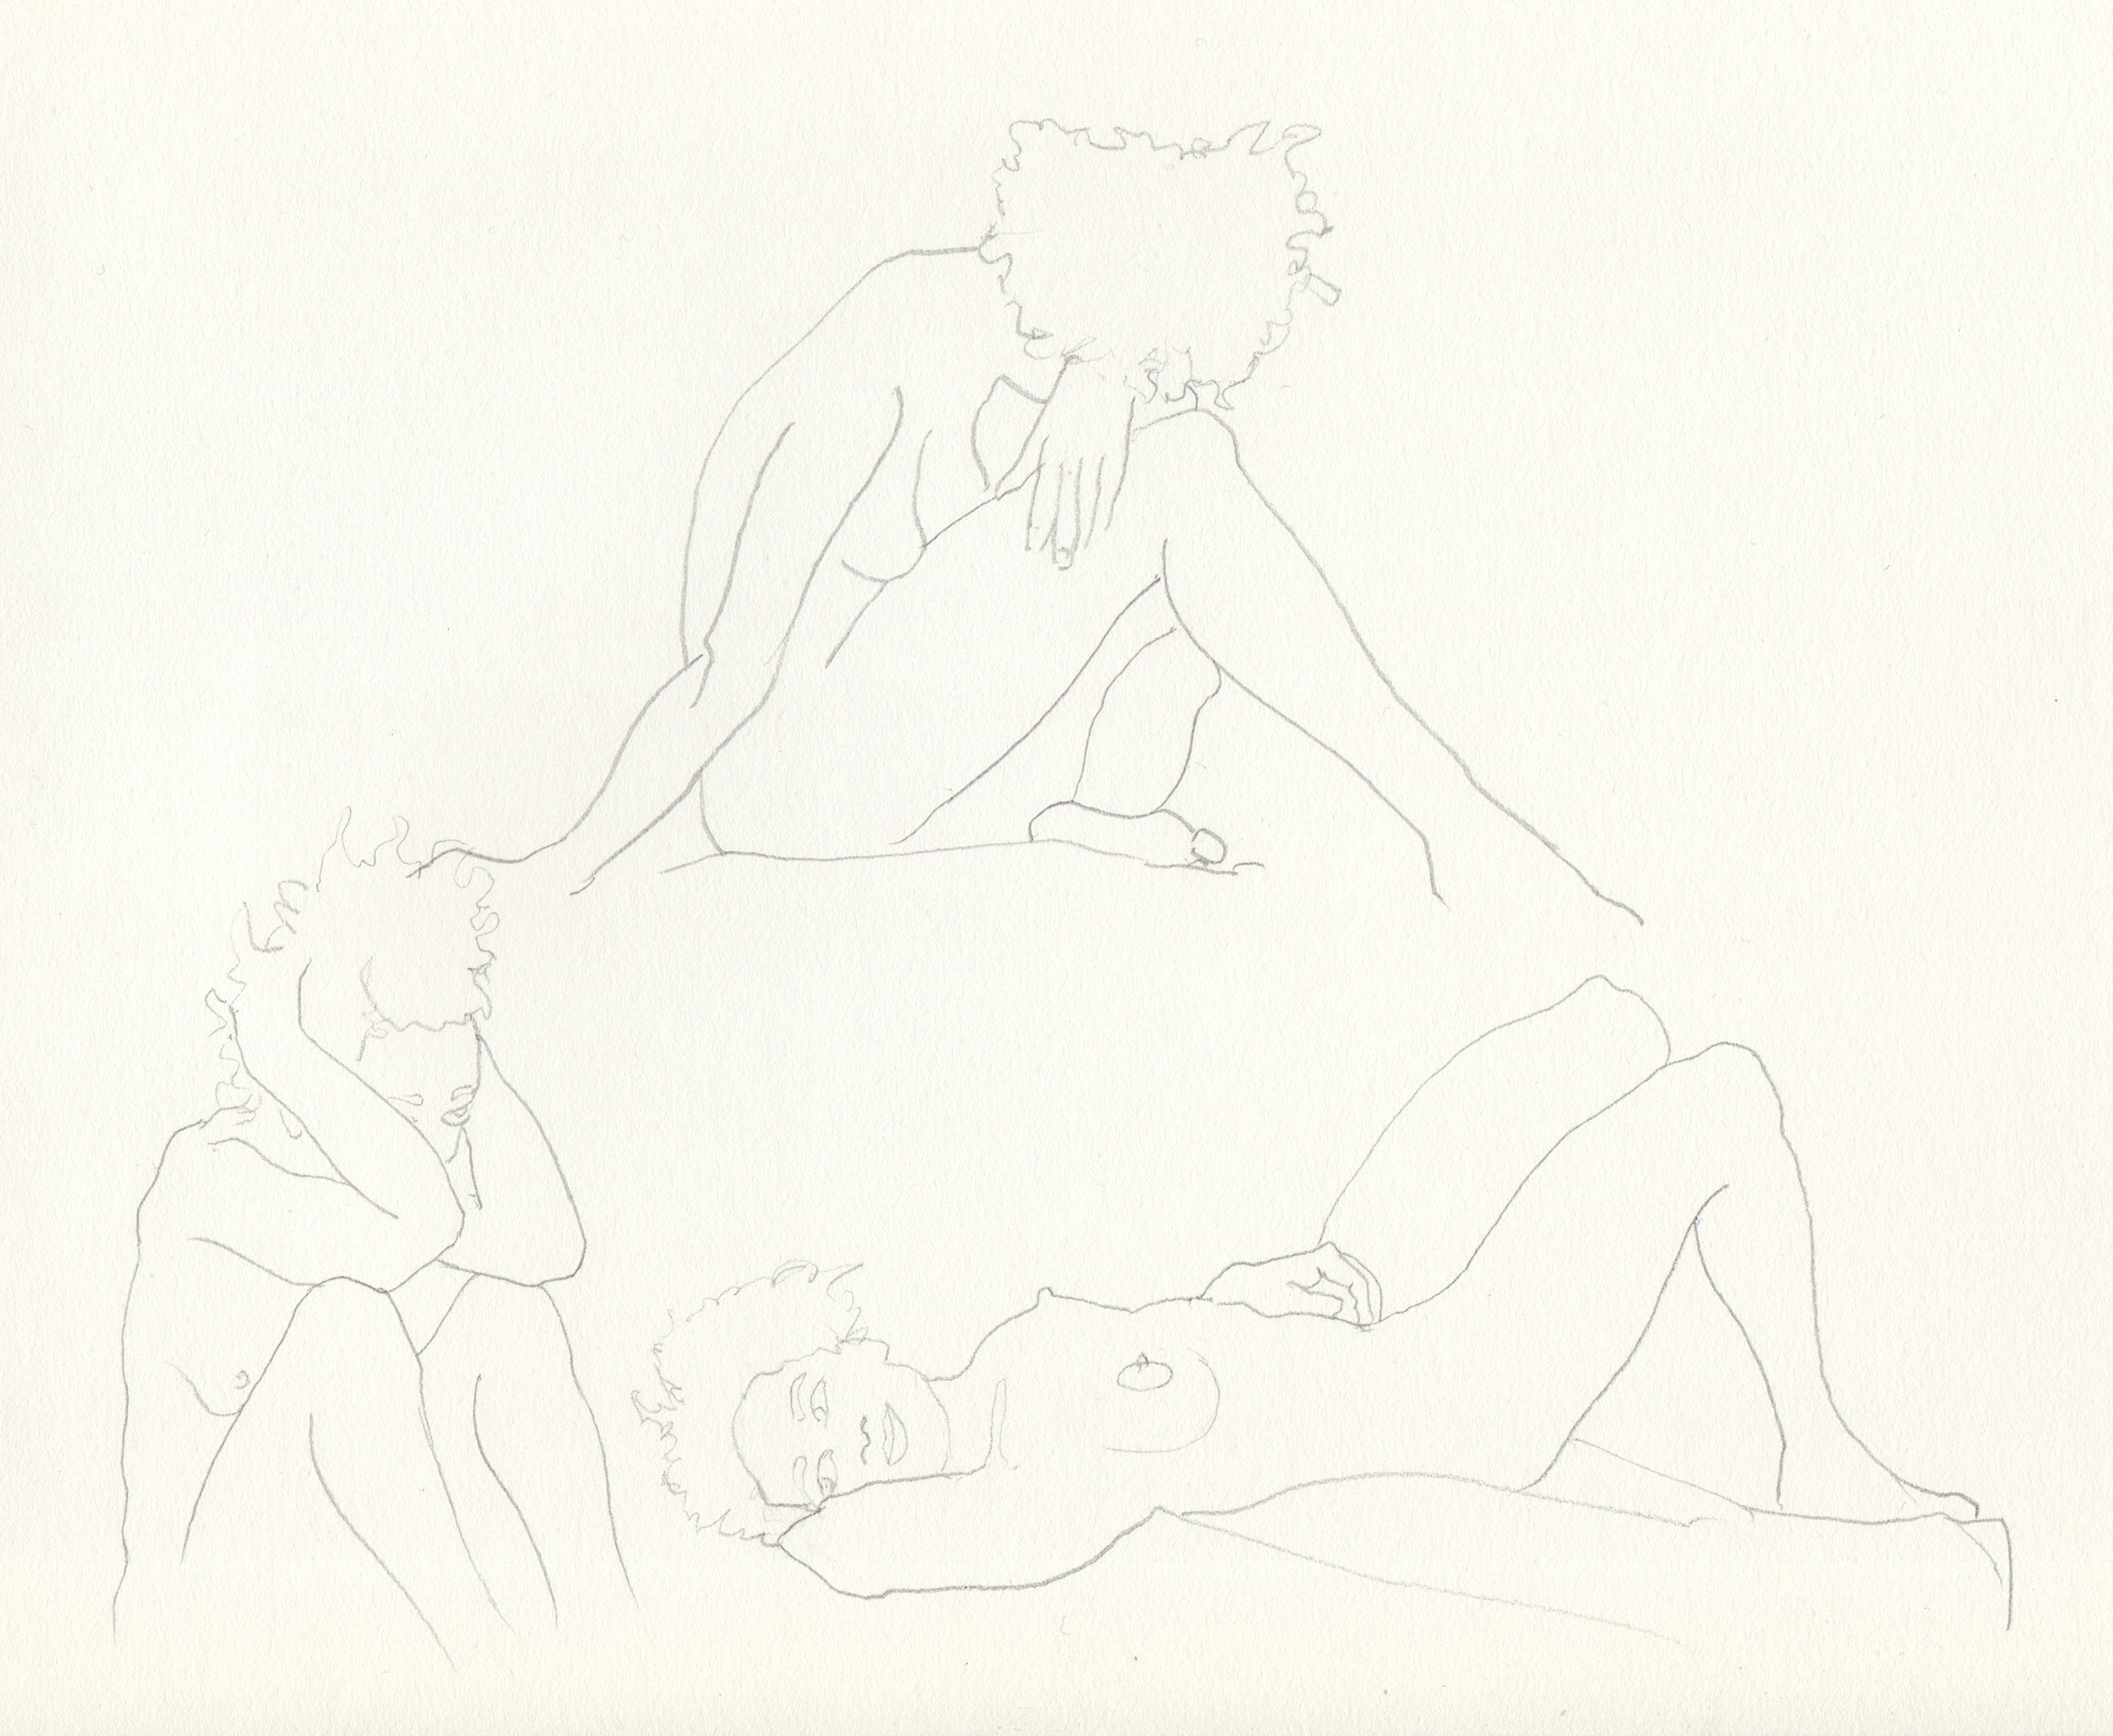 2012_Sketch_F-Beudin_048